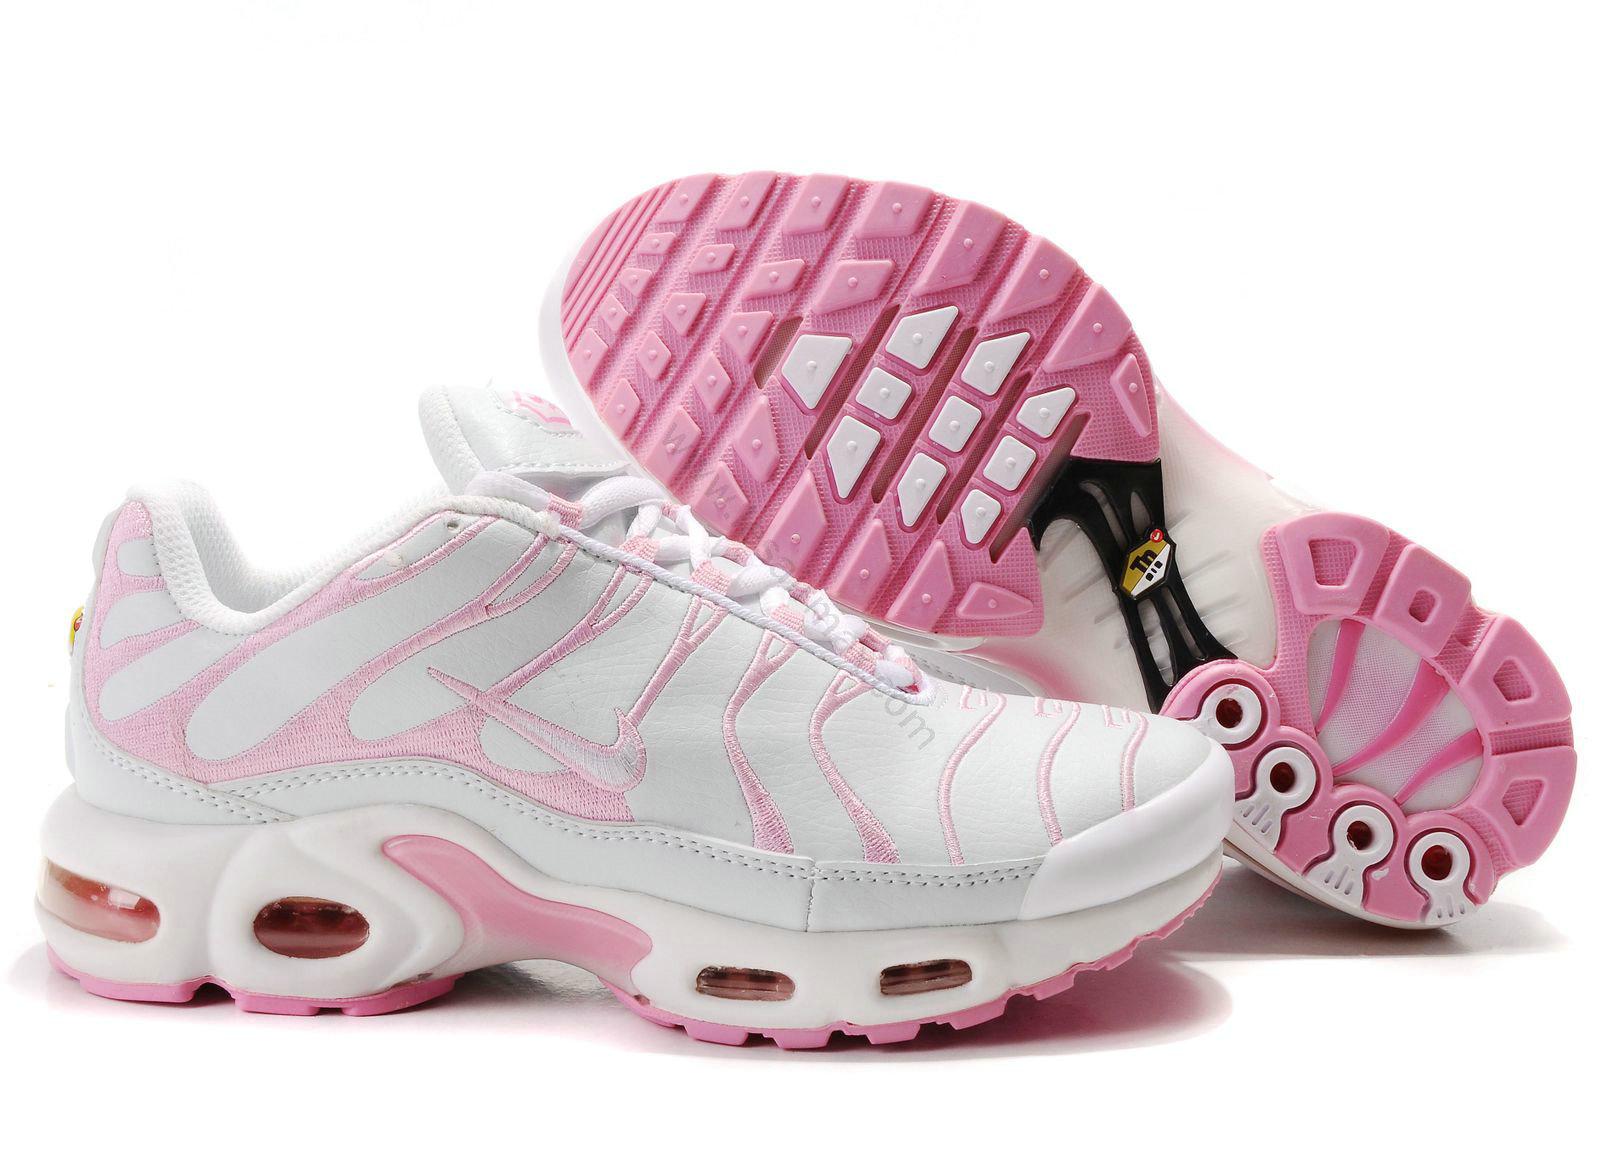 half off 39701 bafd3 Chaussures Nike air max TN femme mode Blanc et Rose,air max nike,soldes